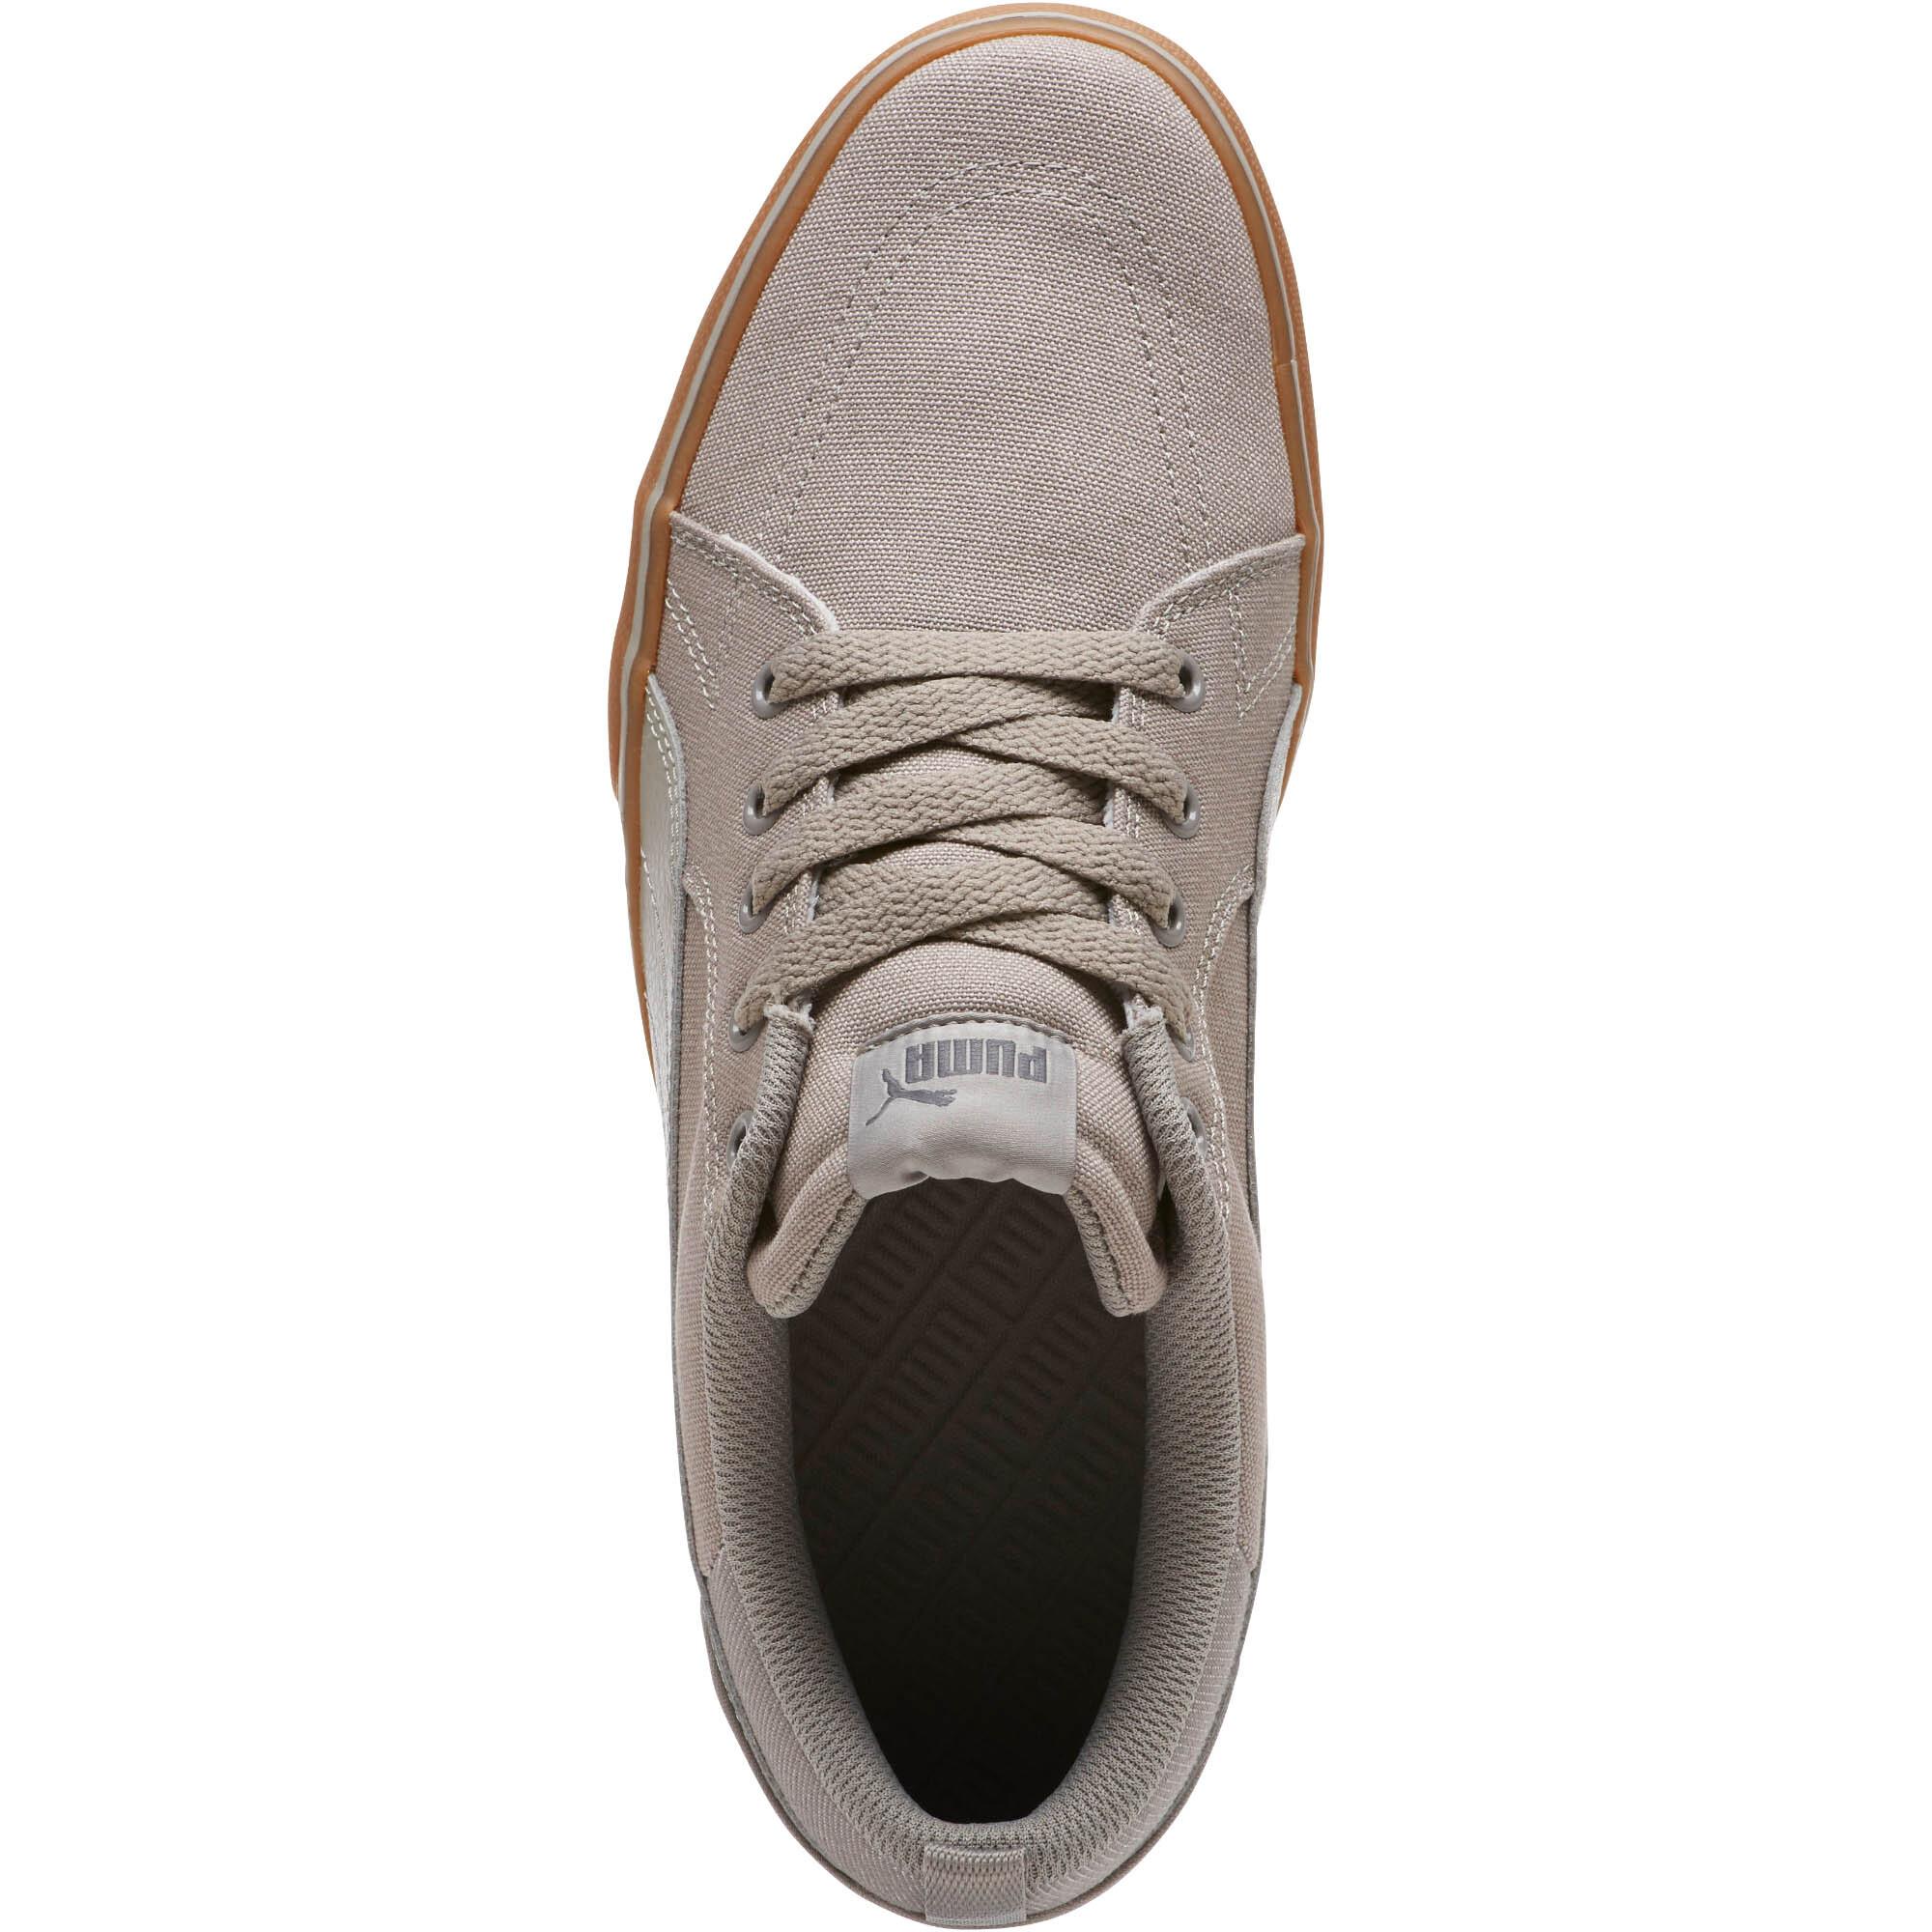 PUMA-PUMA-Bridger-Men-039-s-Sneakers-Men-Shoe-Basics thumbnail 12